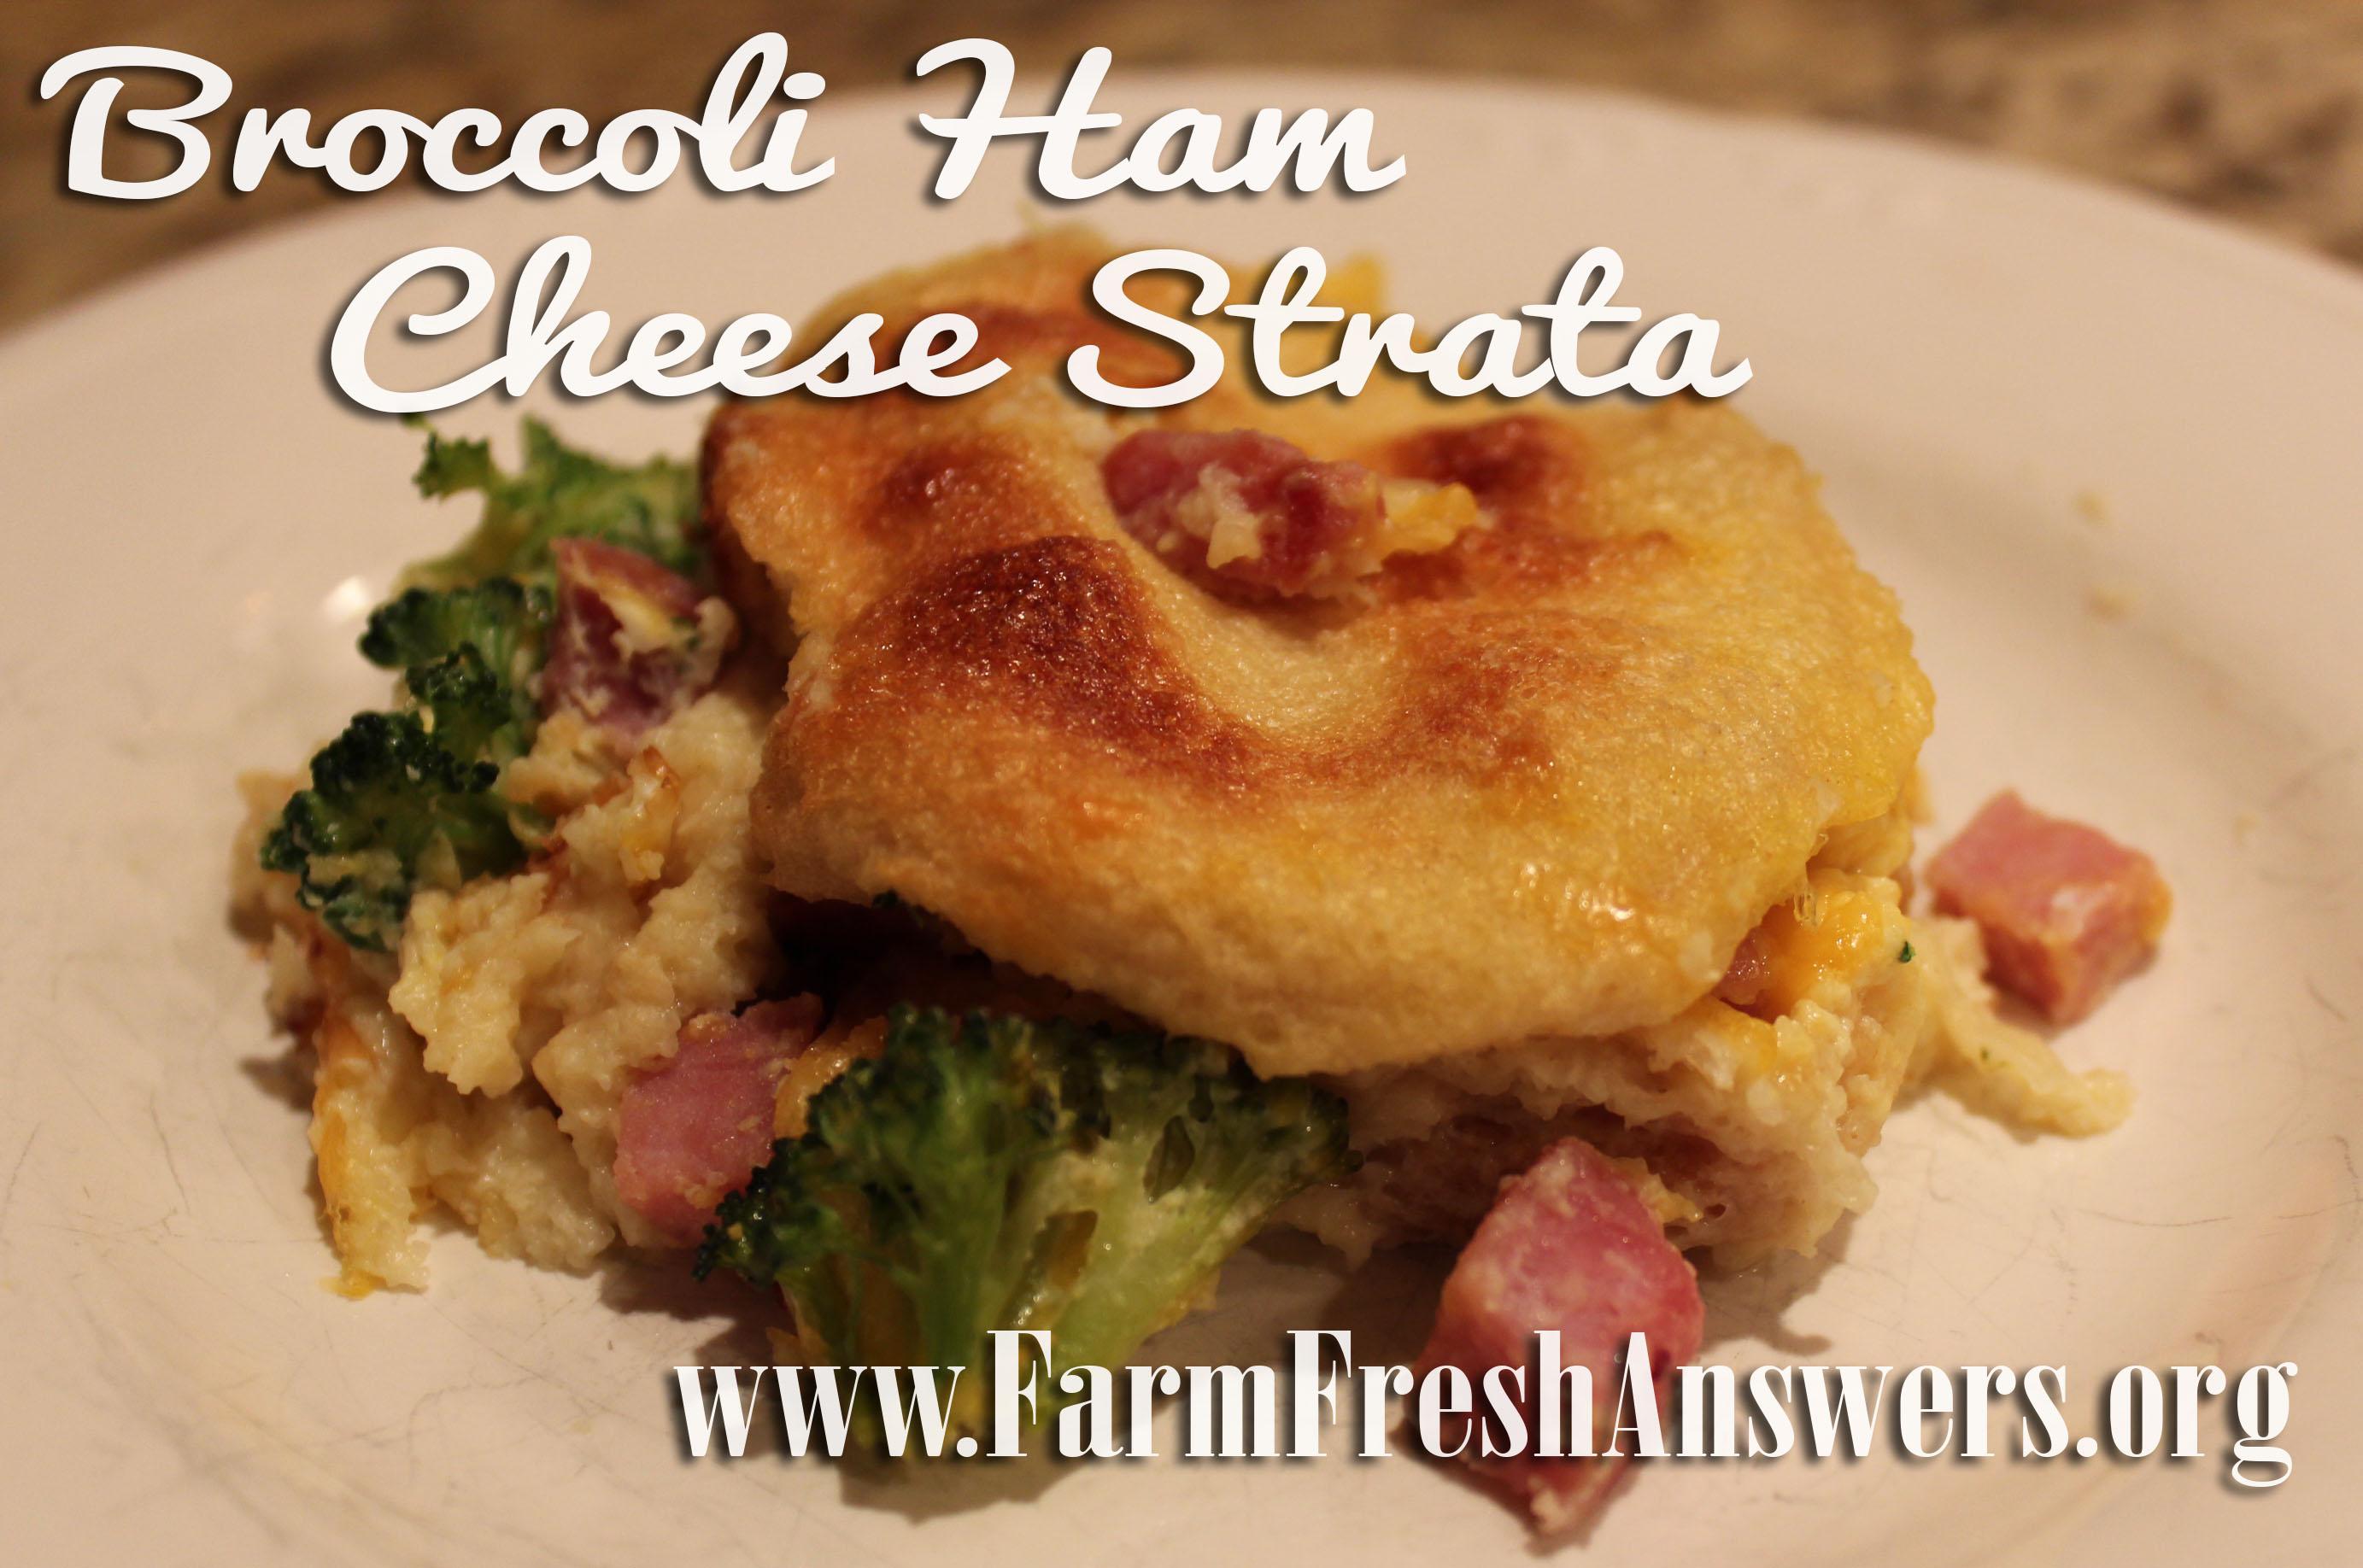 Broccoli Ham Cheese Strada